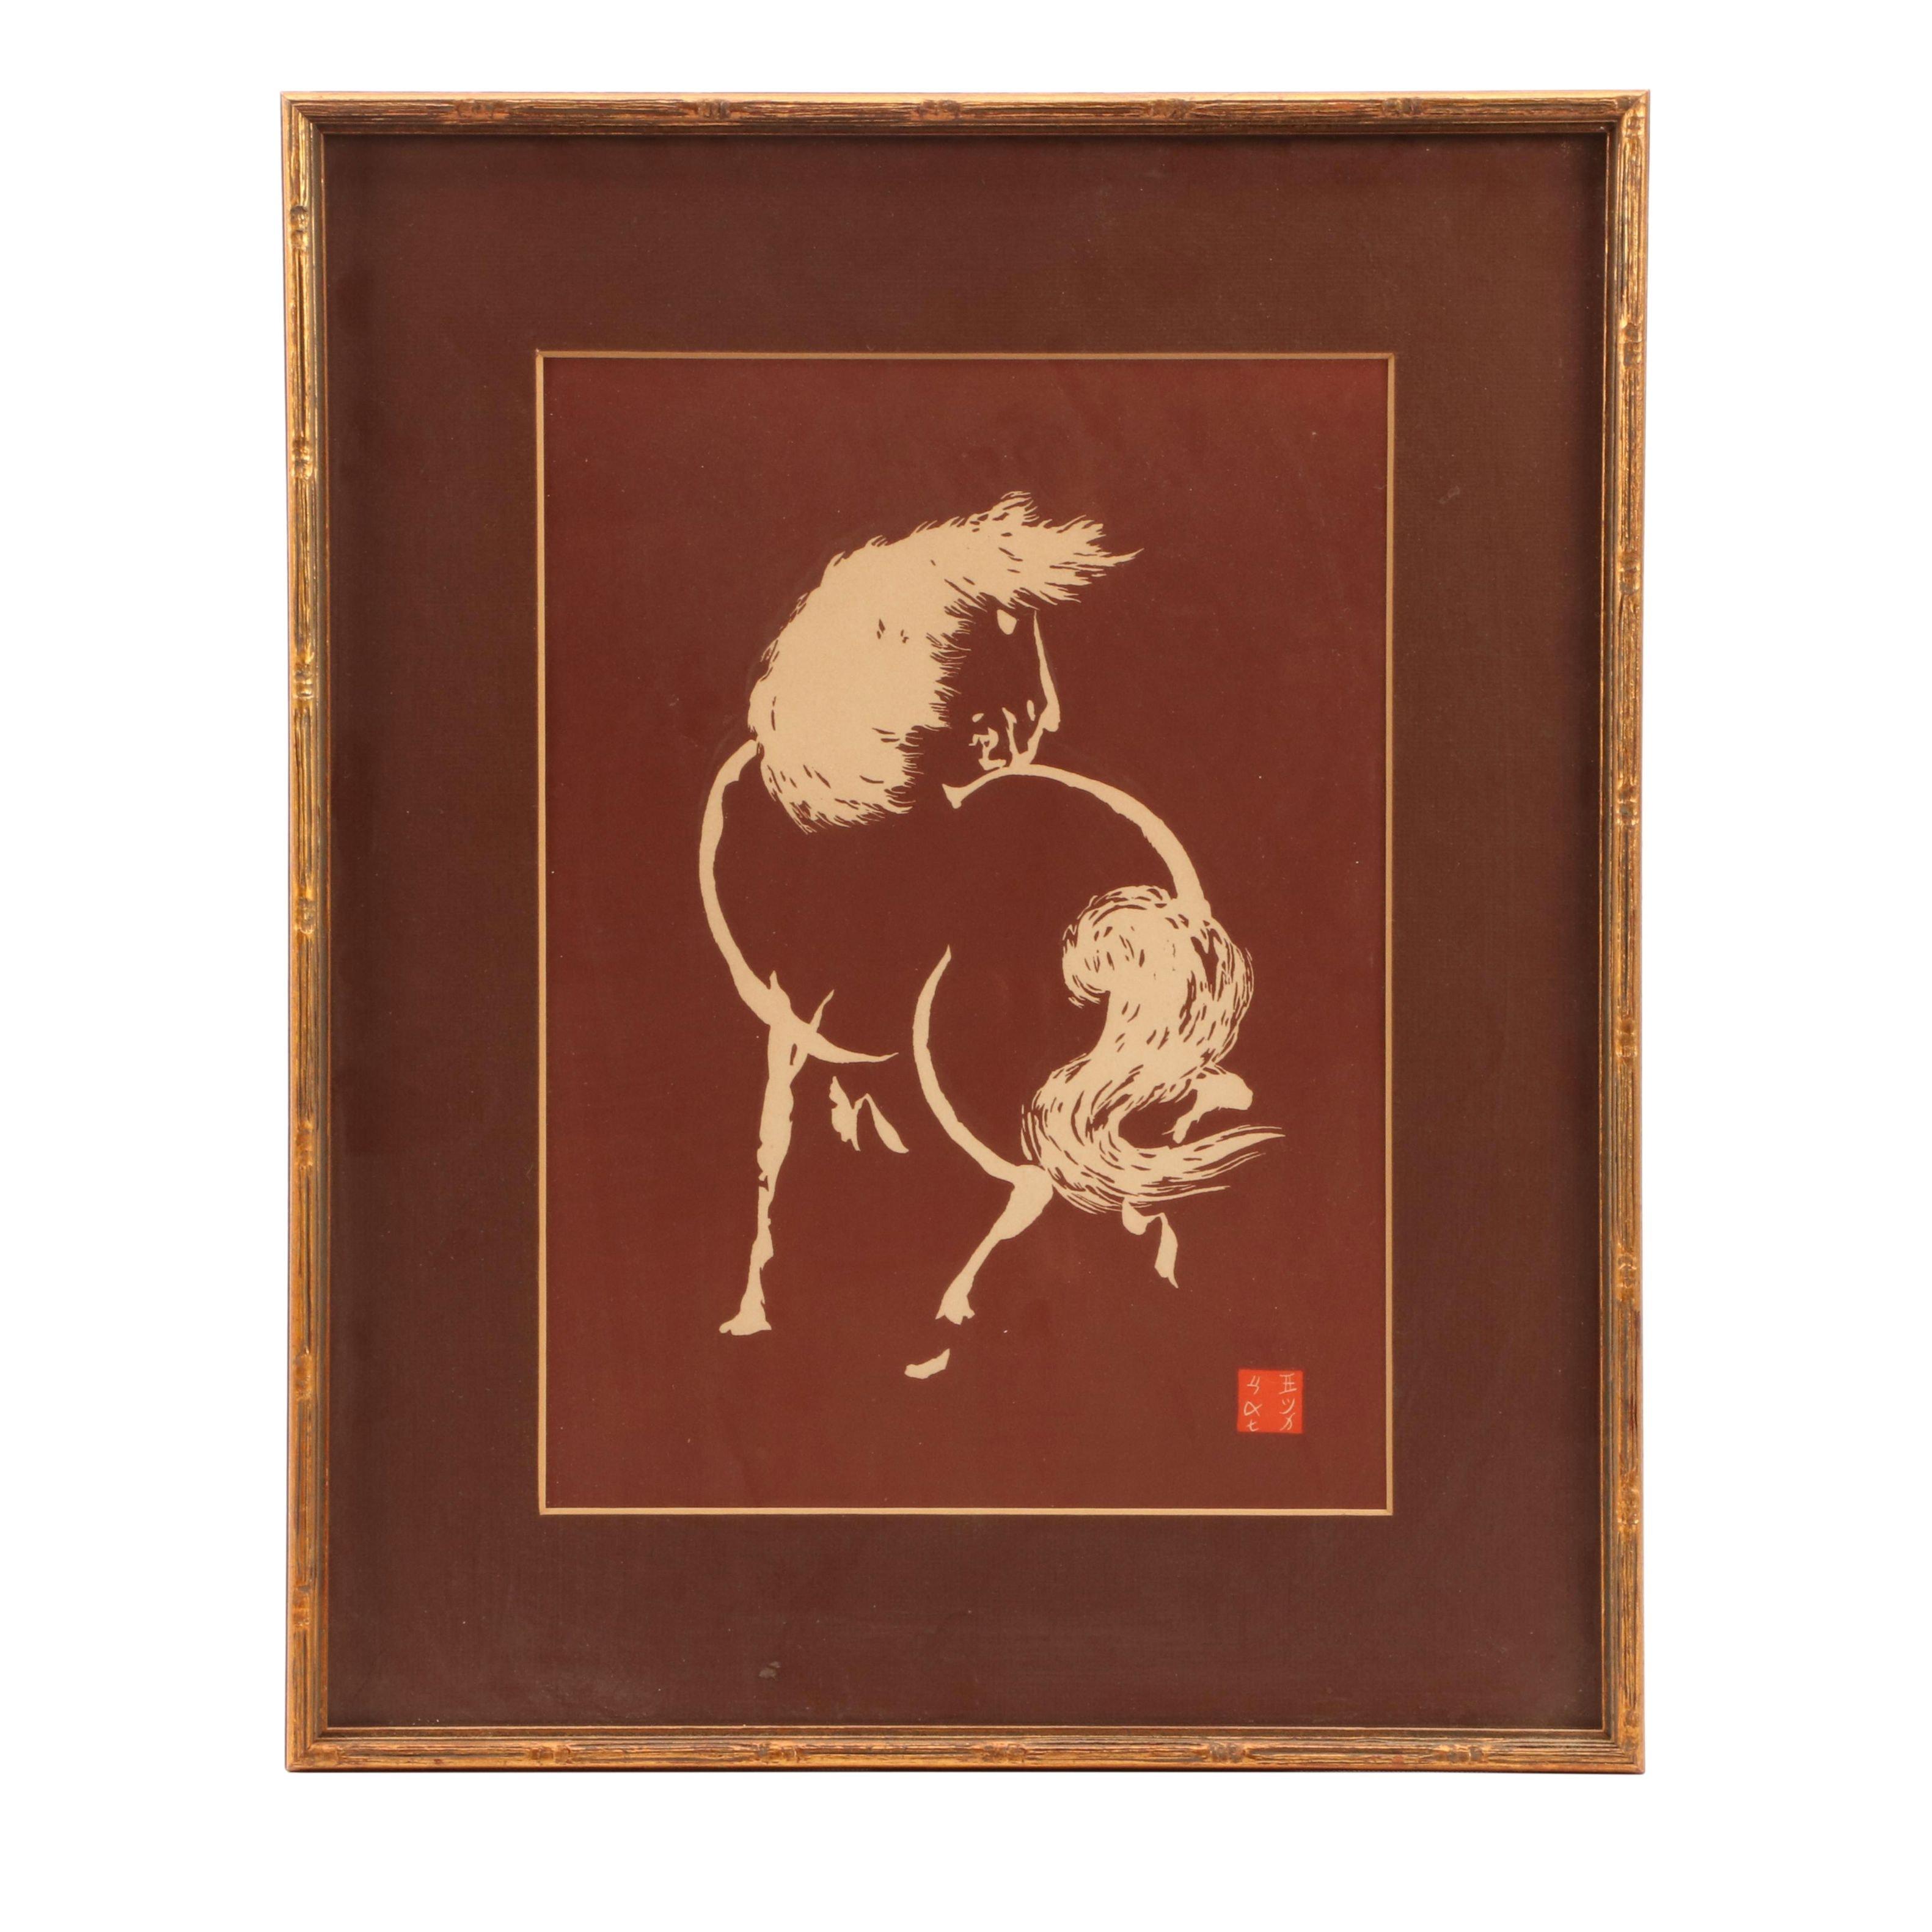 Horse Woodblock Print in the Manner of Urushibara Mokuchu